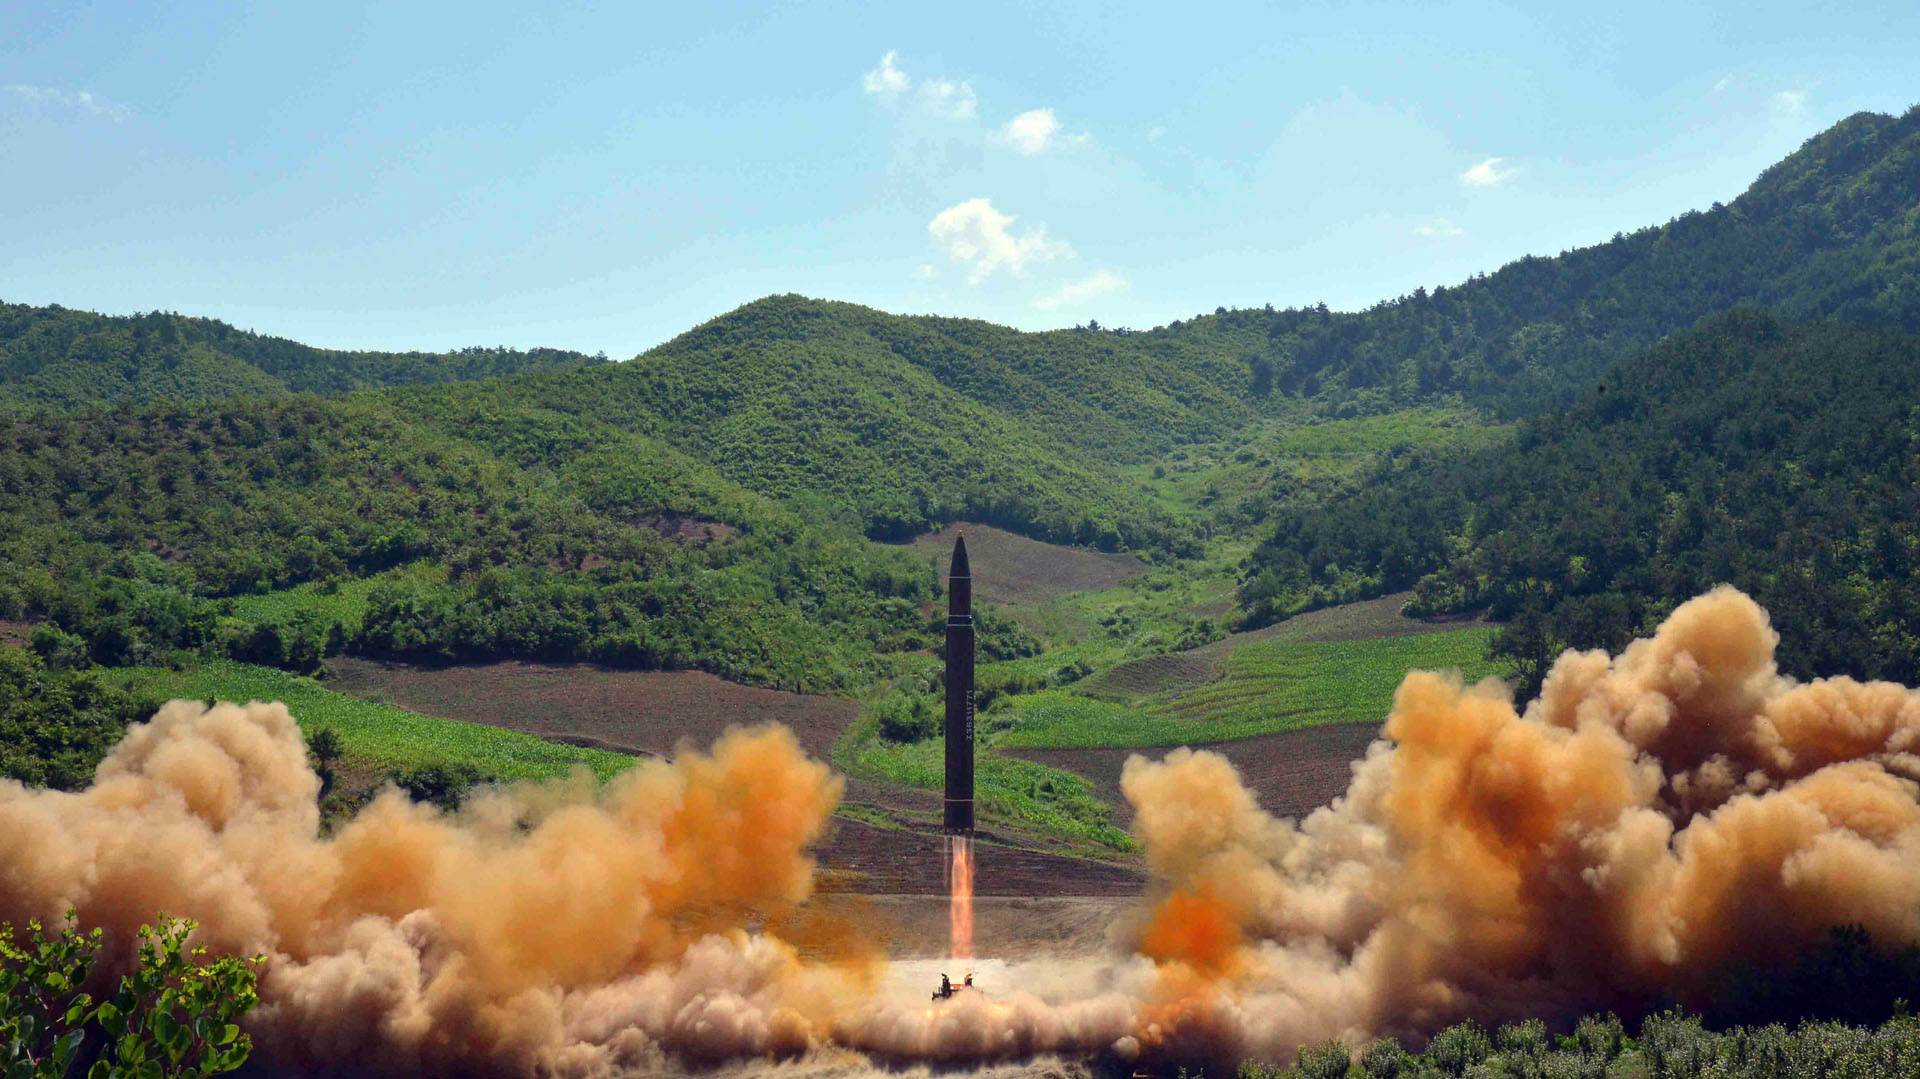 Según datos del régimen, el Hwasong-14 voló a 2.802 kilómetros de altura por una distancia de 933 kilómetros antes de caer en el Mar de Japón (Reuters/KCNA)